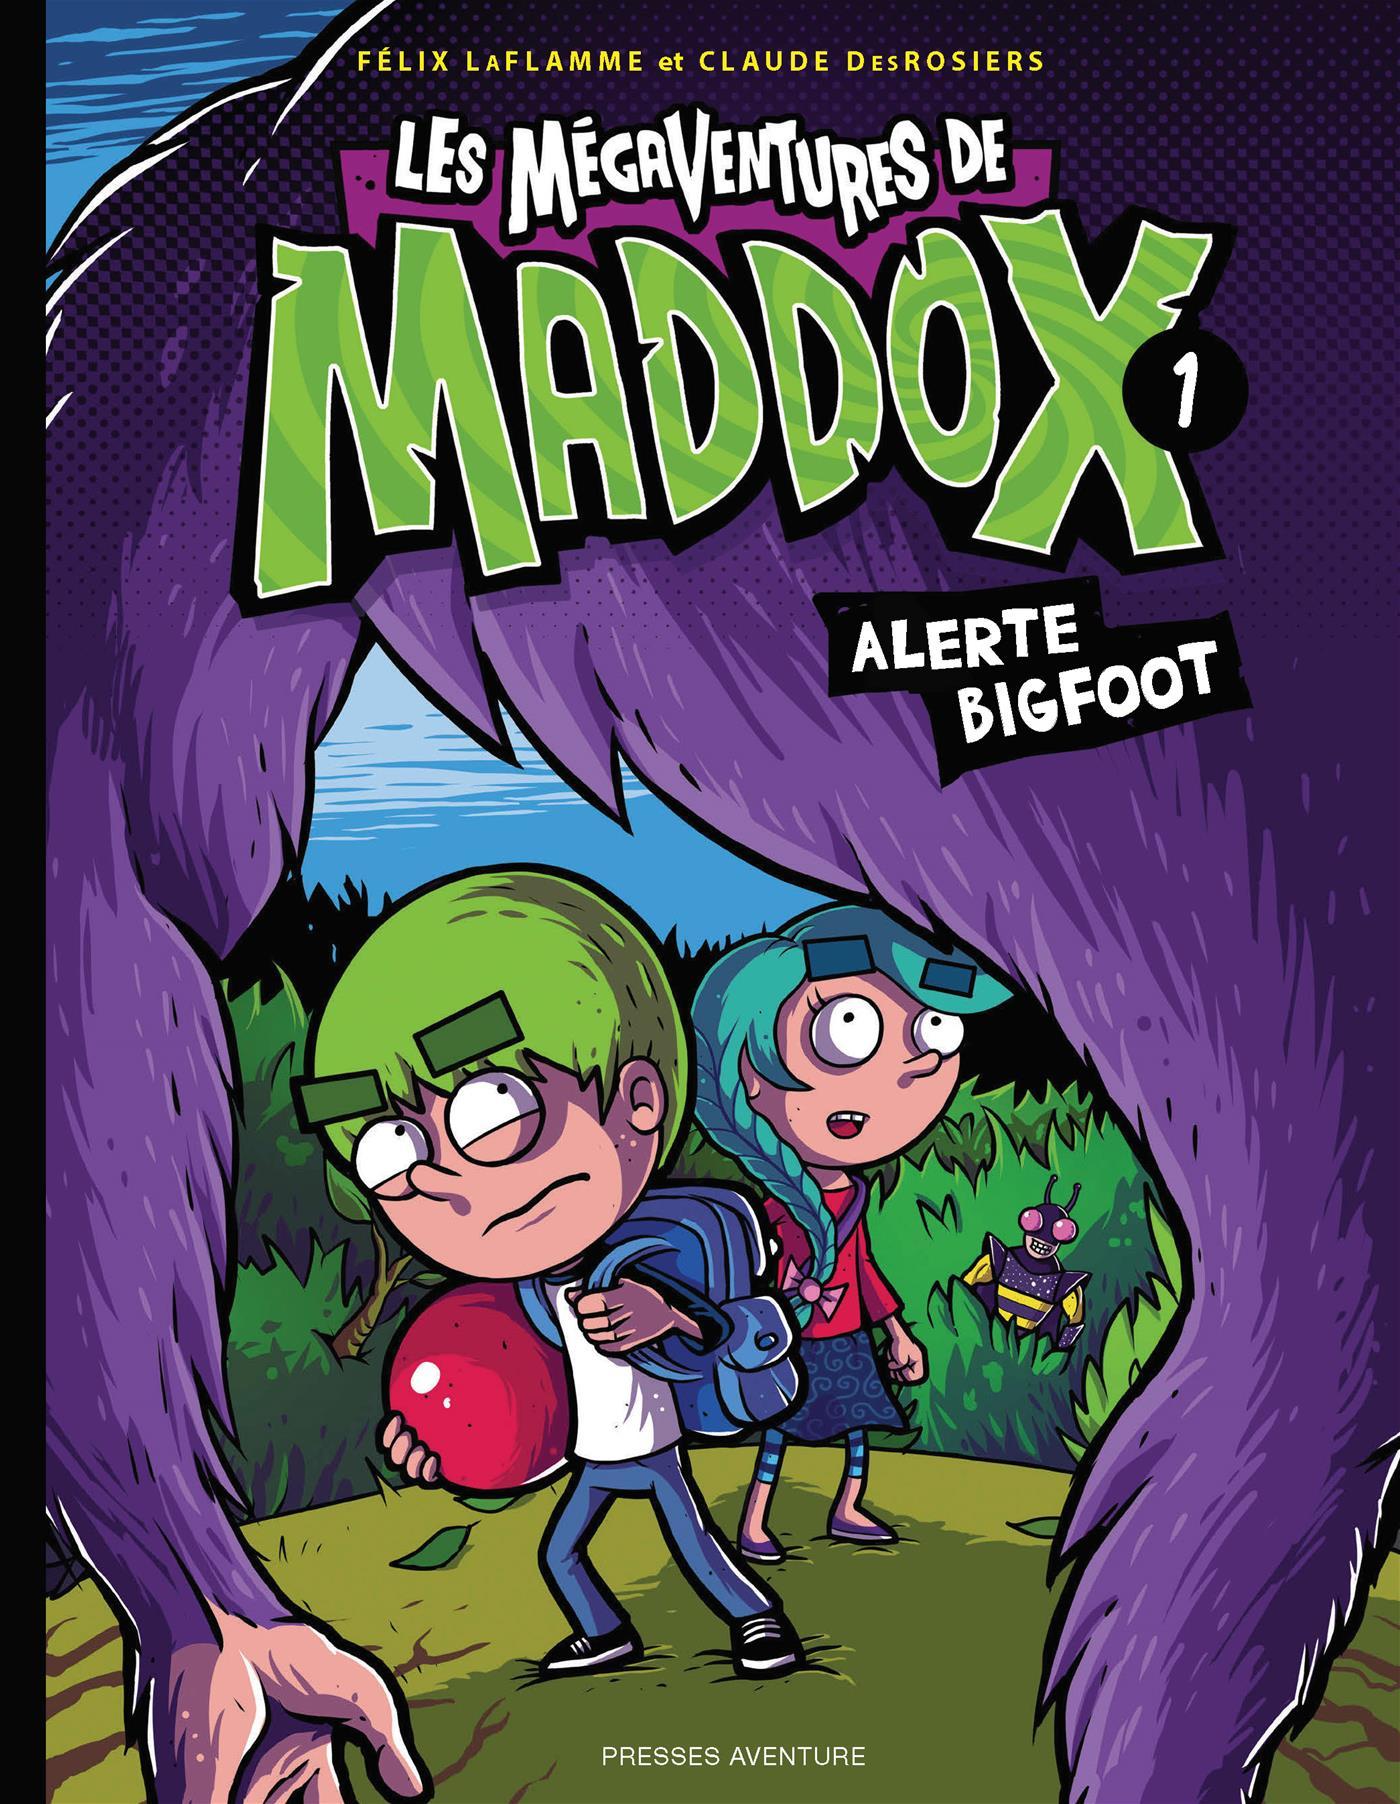 Les Mégaventures de Maddox - Tome 1. Alerte Bigfoot